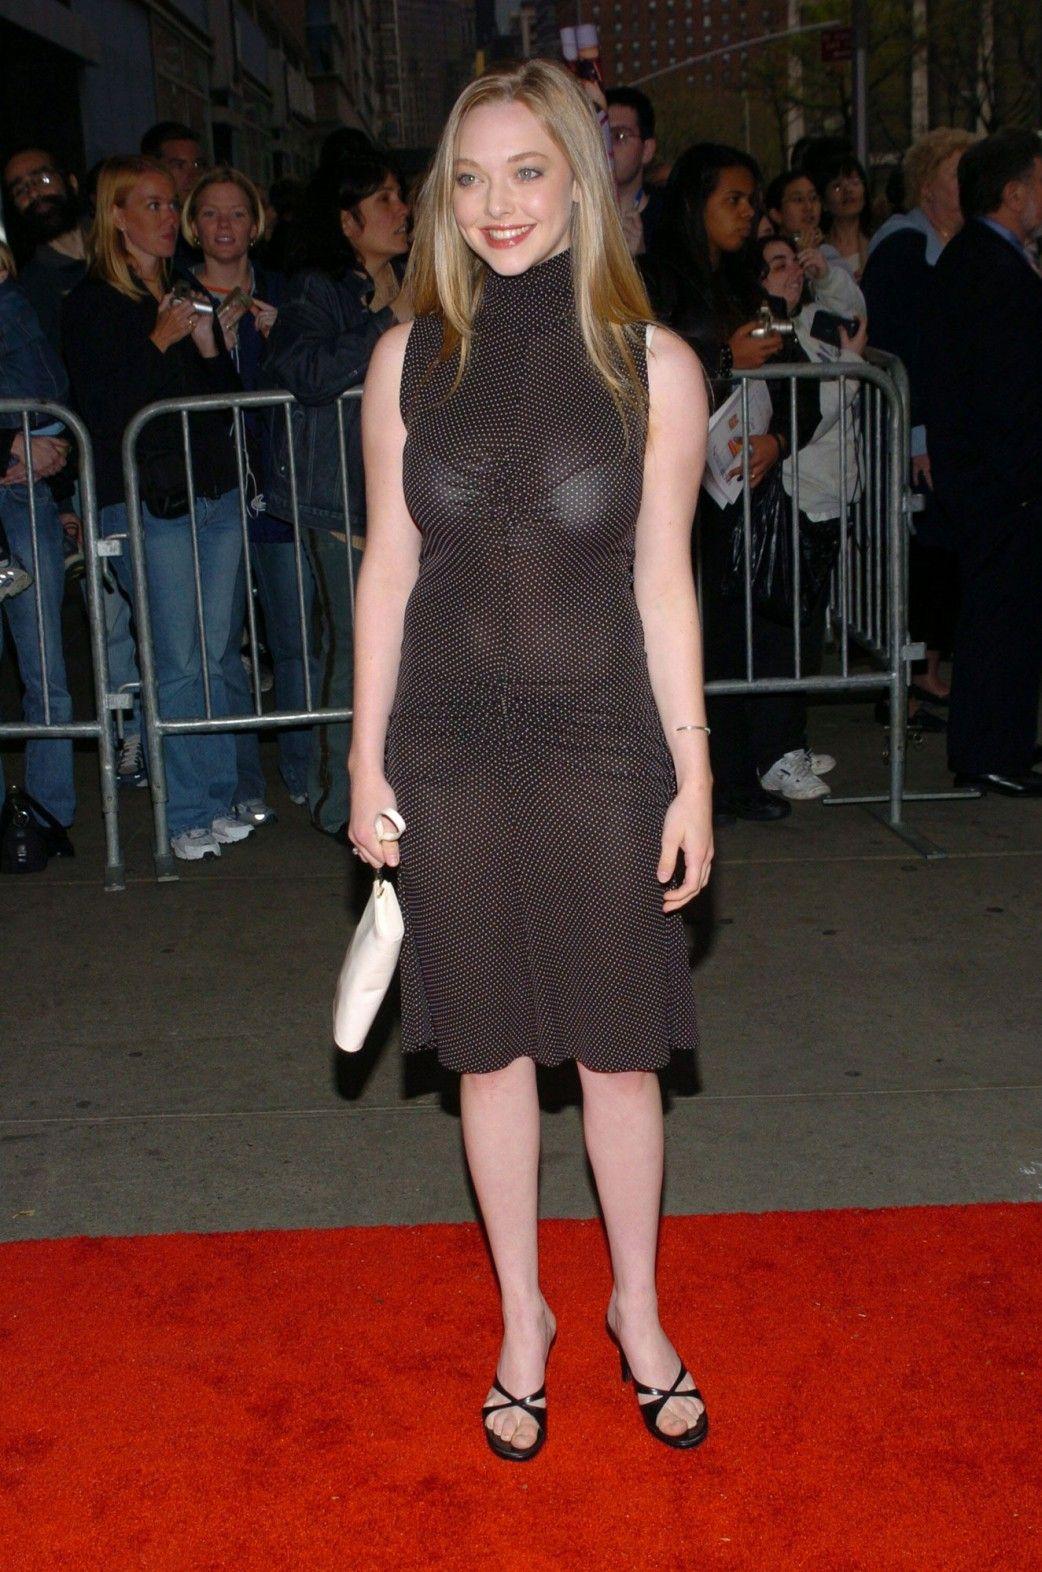 Amanda Seyfried Dr House amanda seyfried's style evolution   amanda seyfried bikini